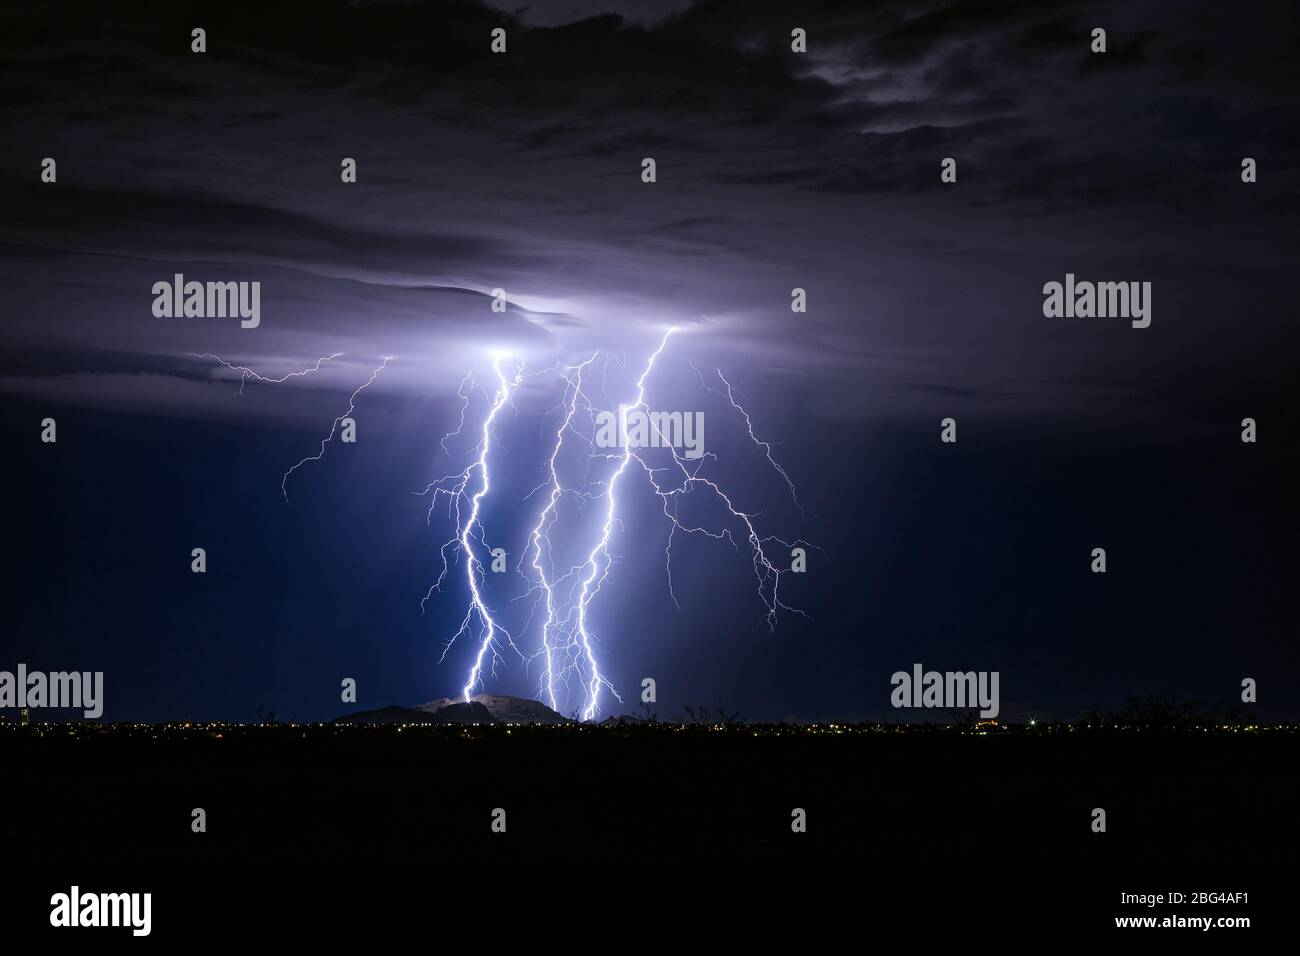 Lightning storm over Casa Grande, Arizona. Stock Photo